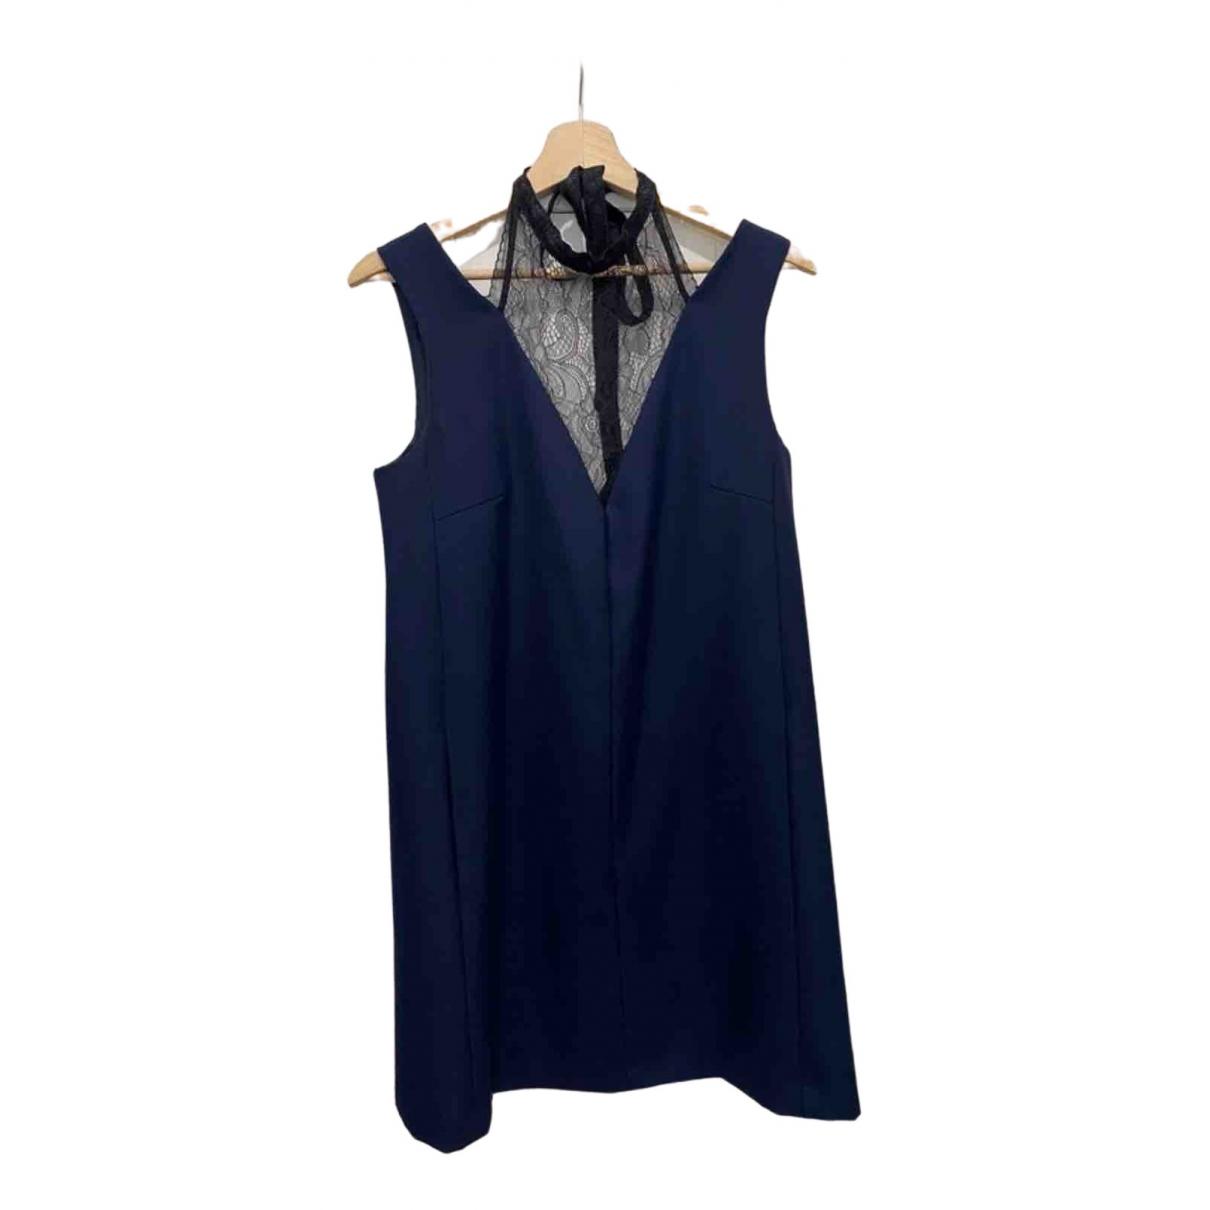 Claudie Pierlot \N Navy Lace dress for Women 40 FR